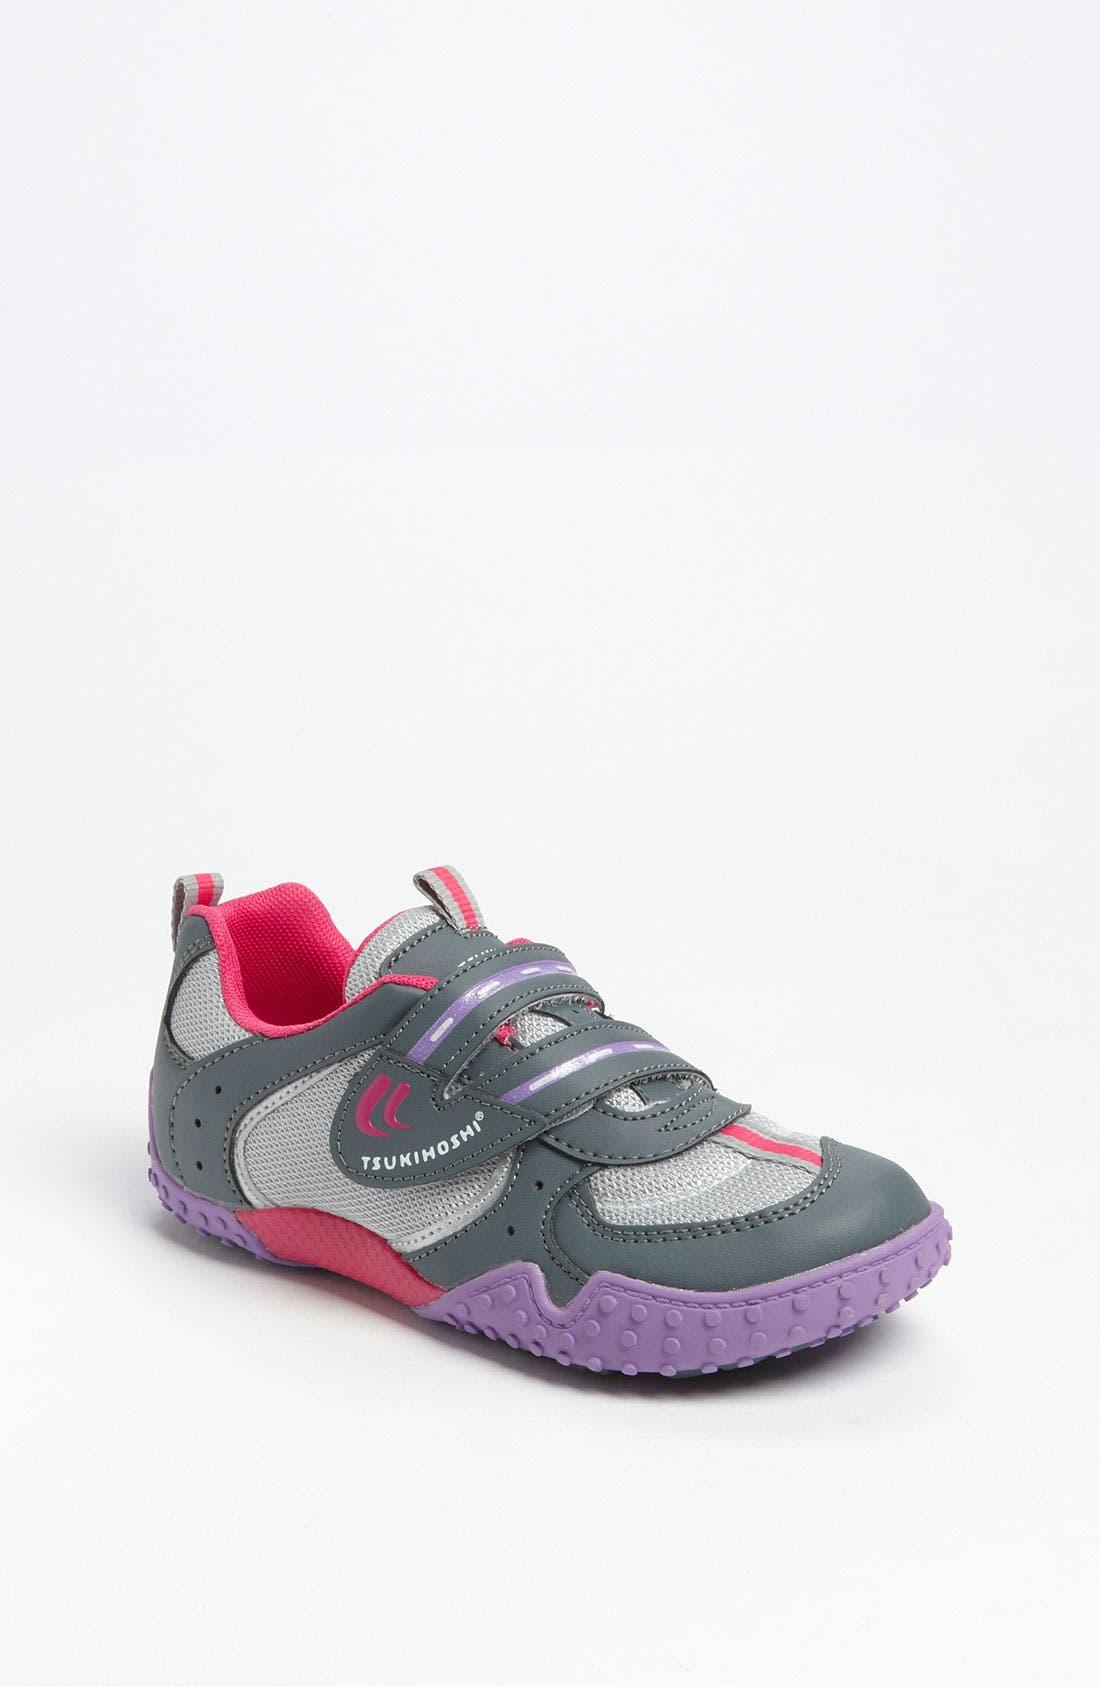 Alternate Image 1 Selected - Tsukihoshi 'Child 28' Sneaker (Walker, Toddler & Little Kid)